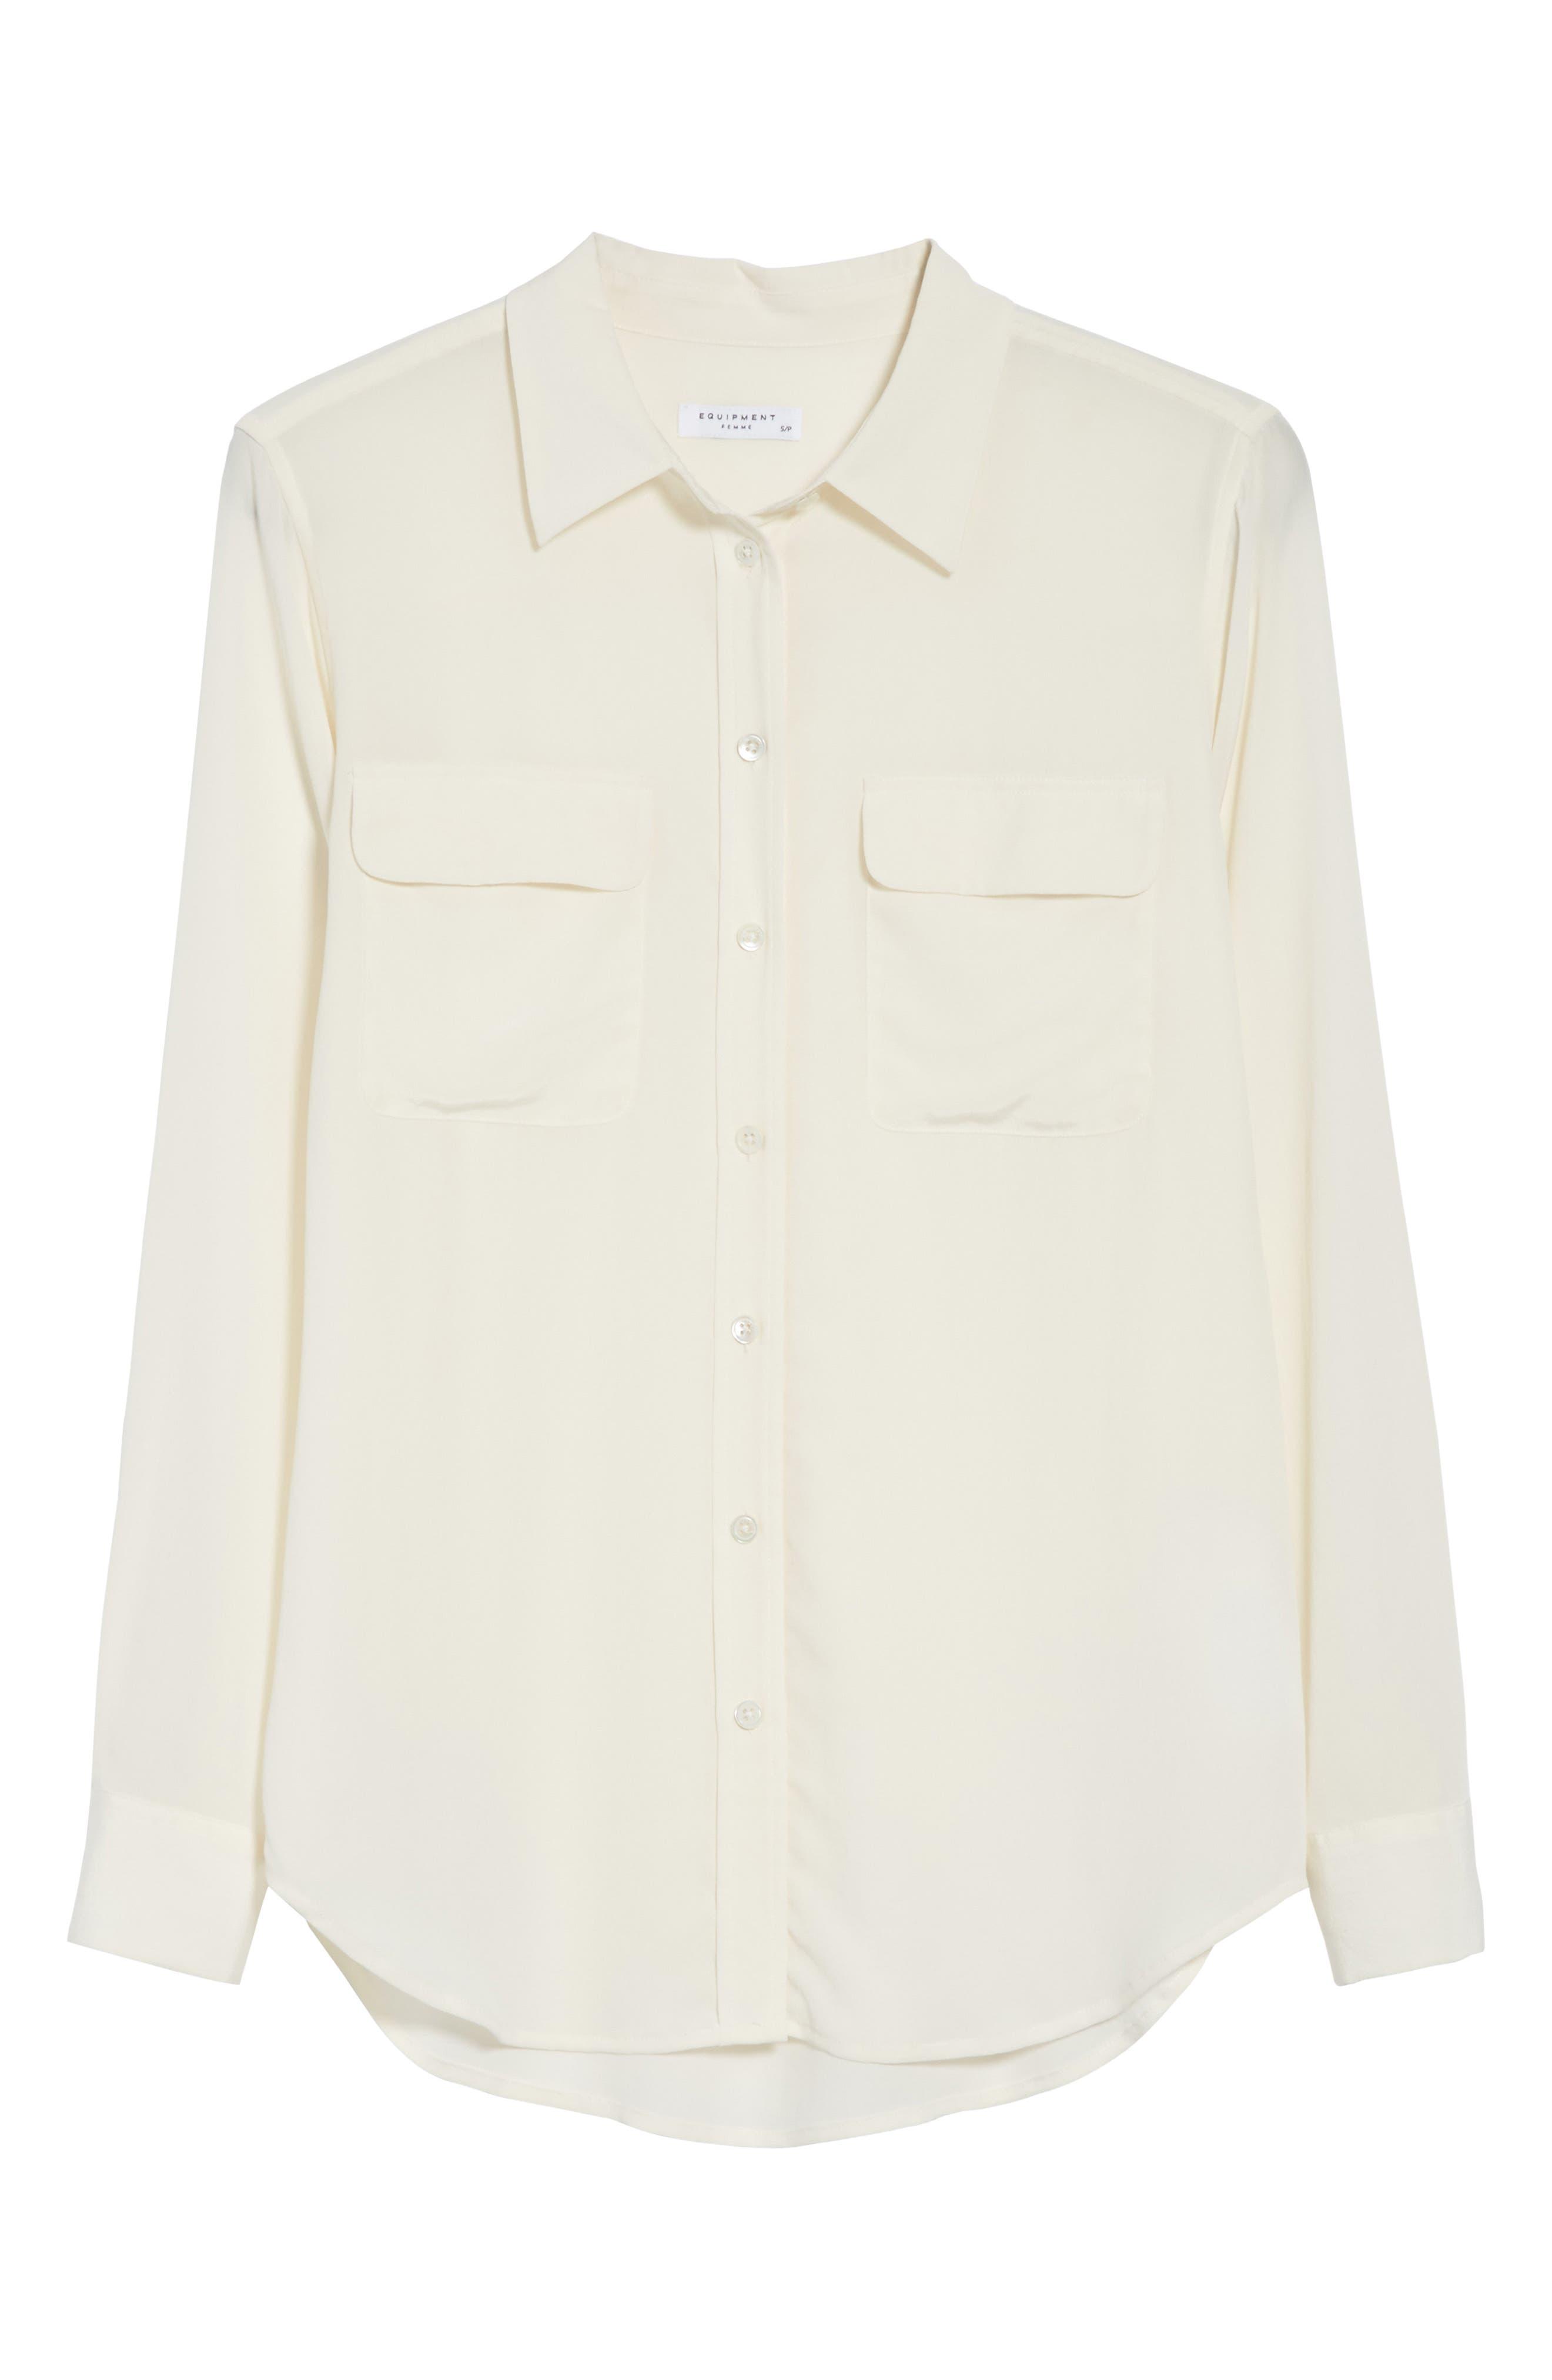 EQUIPMENT,                             'Slim Signature' Silk Shirt,                             Alternate thumbnail 6, color,                             BRIGHT WHITE